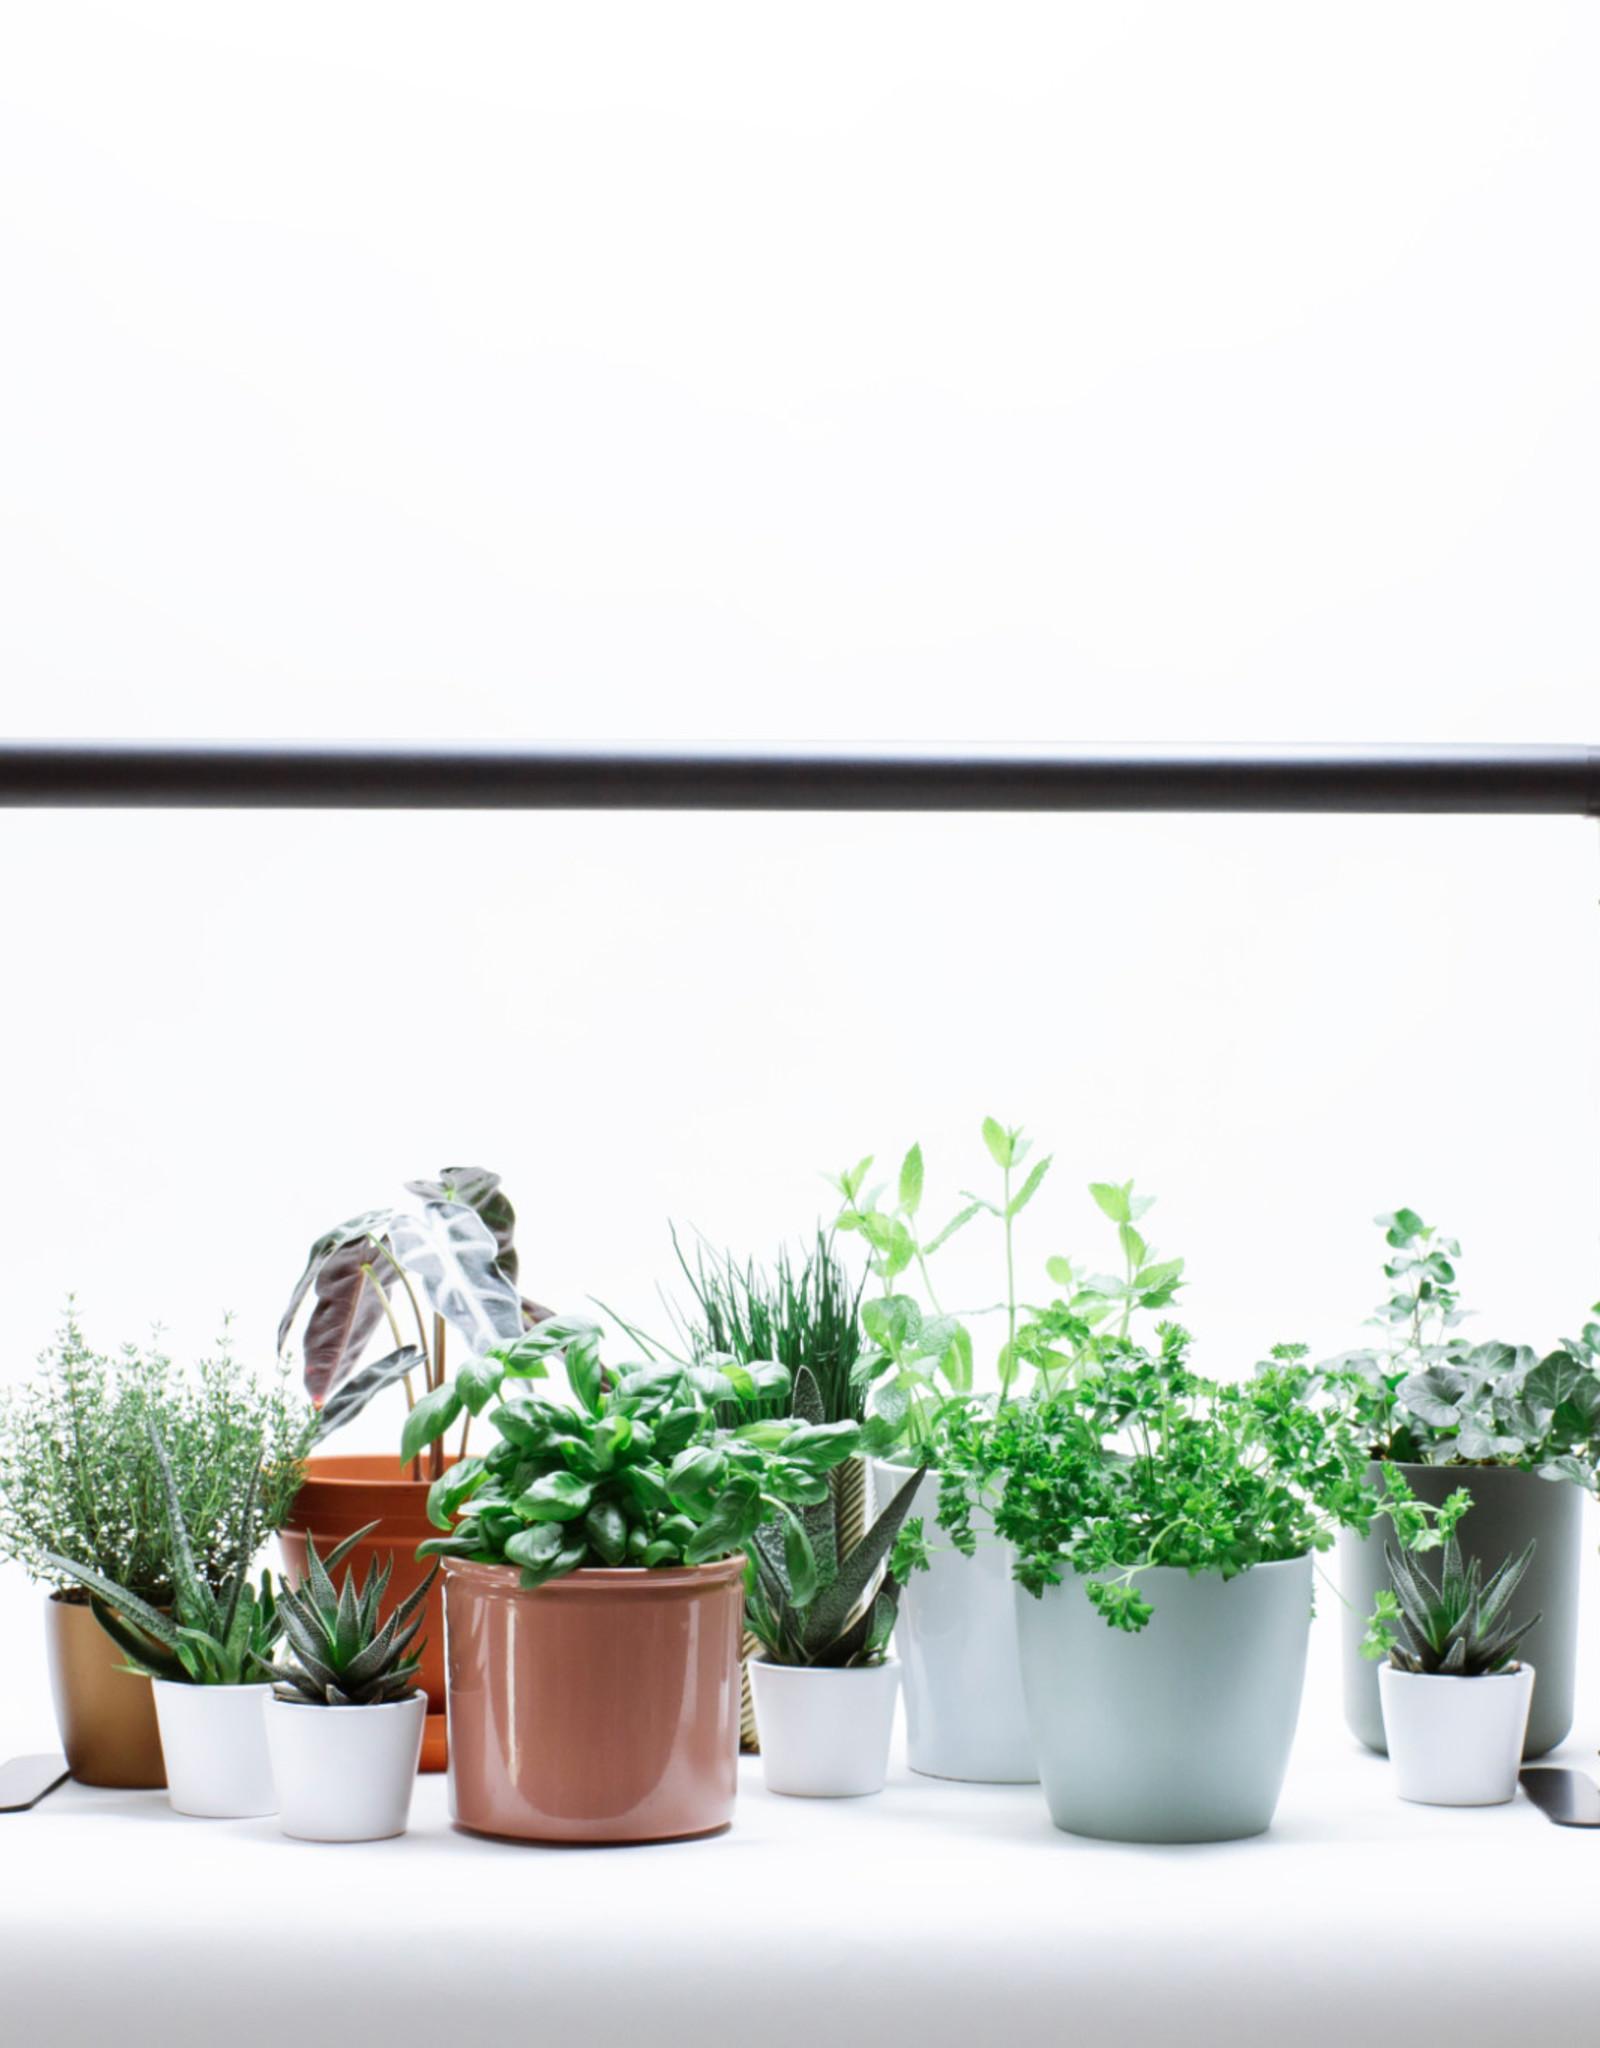 Mother Life PlantSpectrum32 - Growlight - horizontal